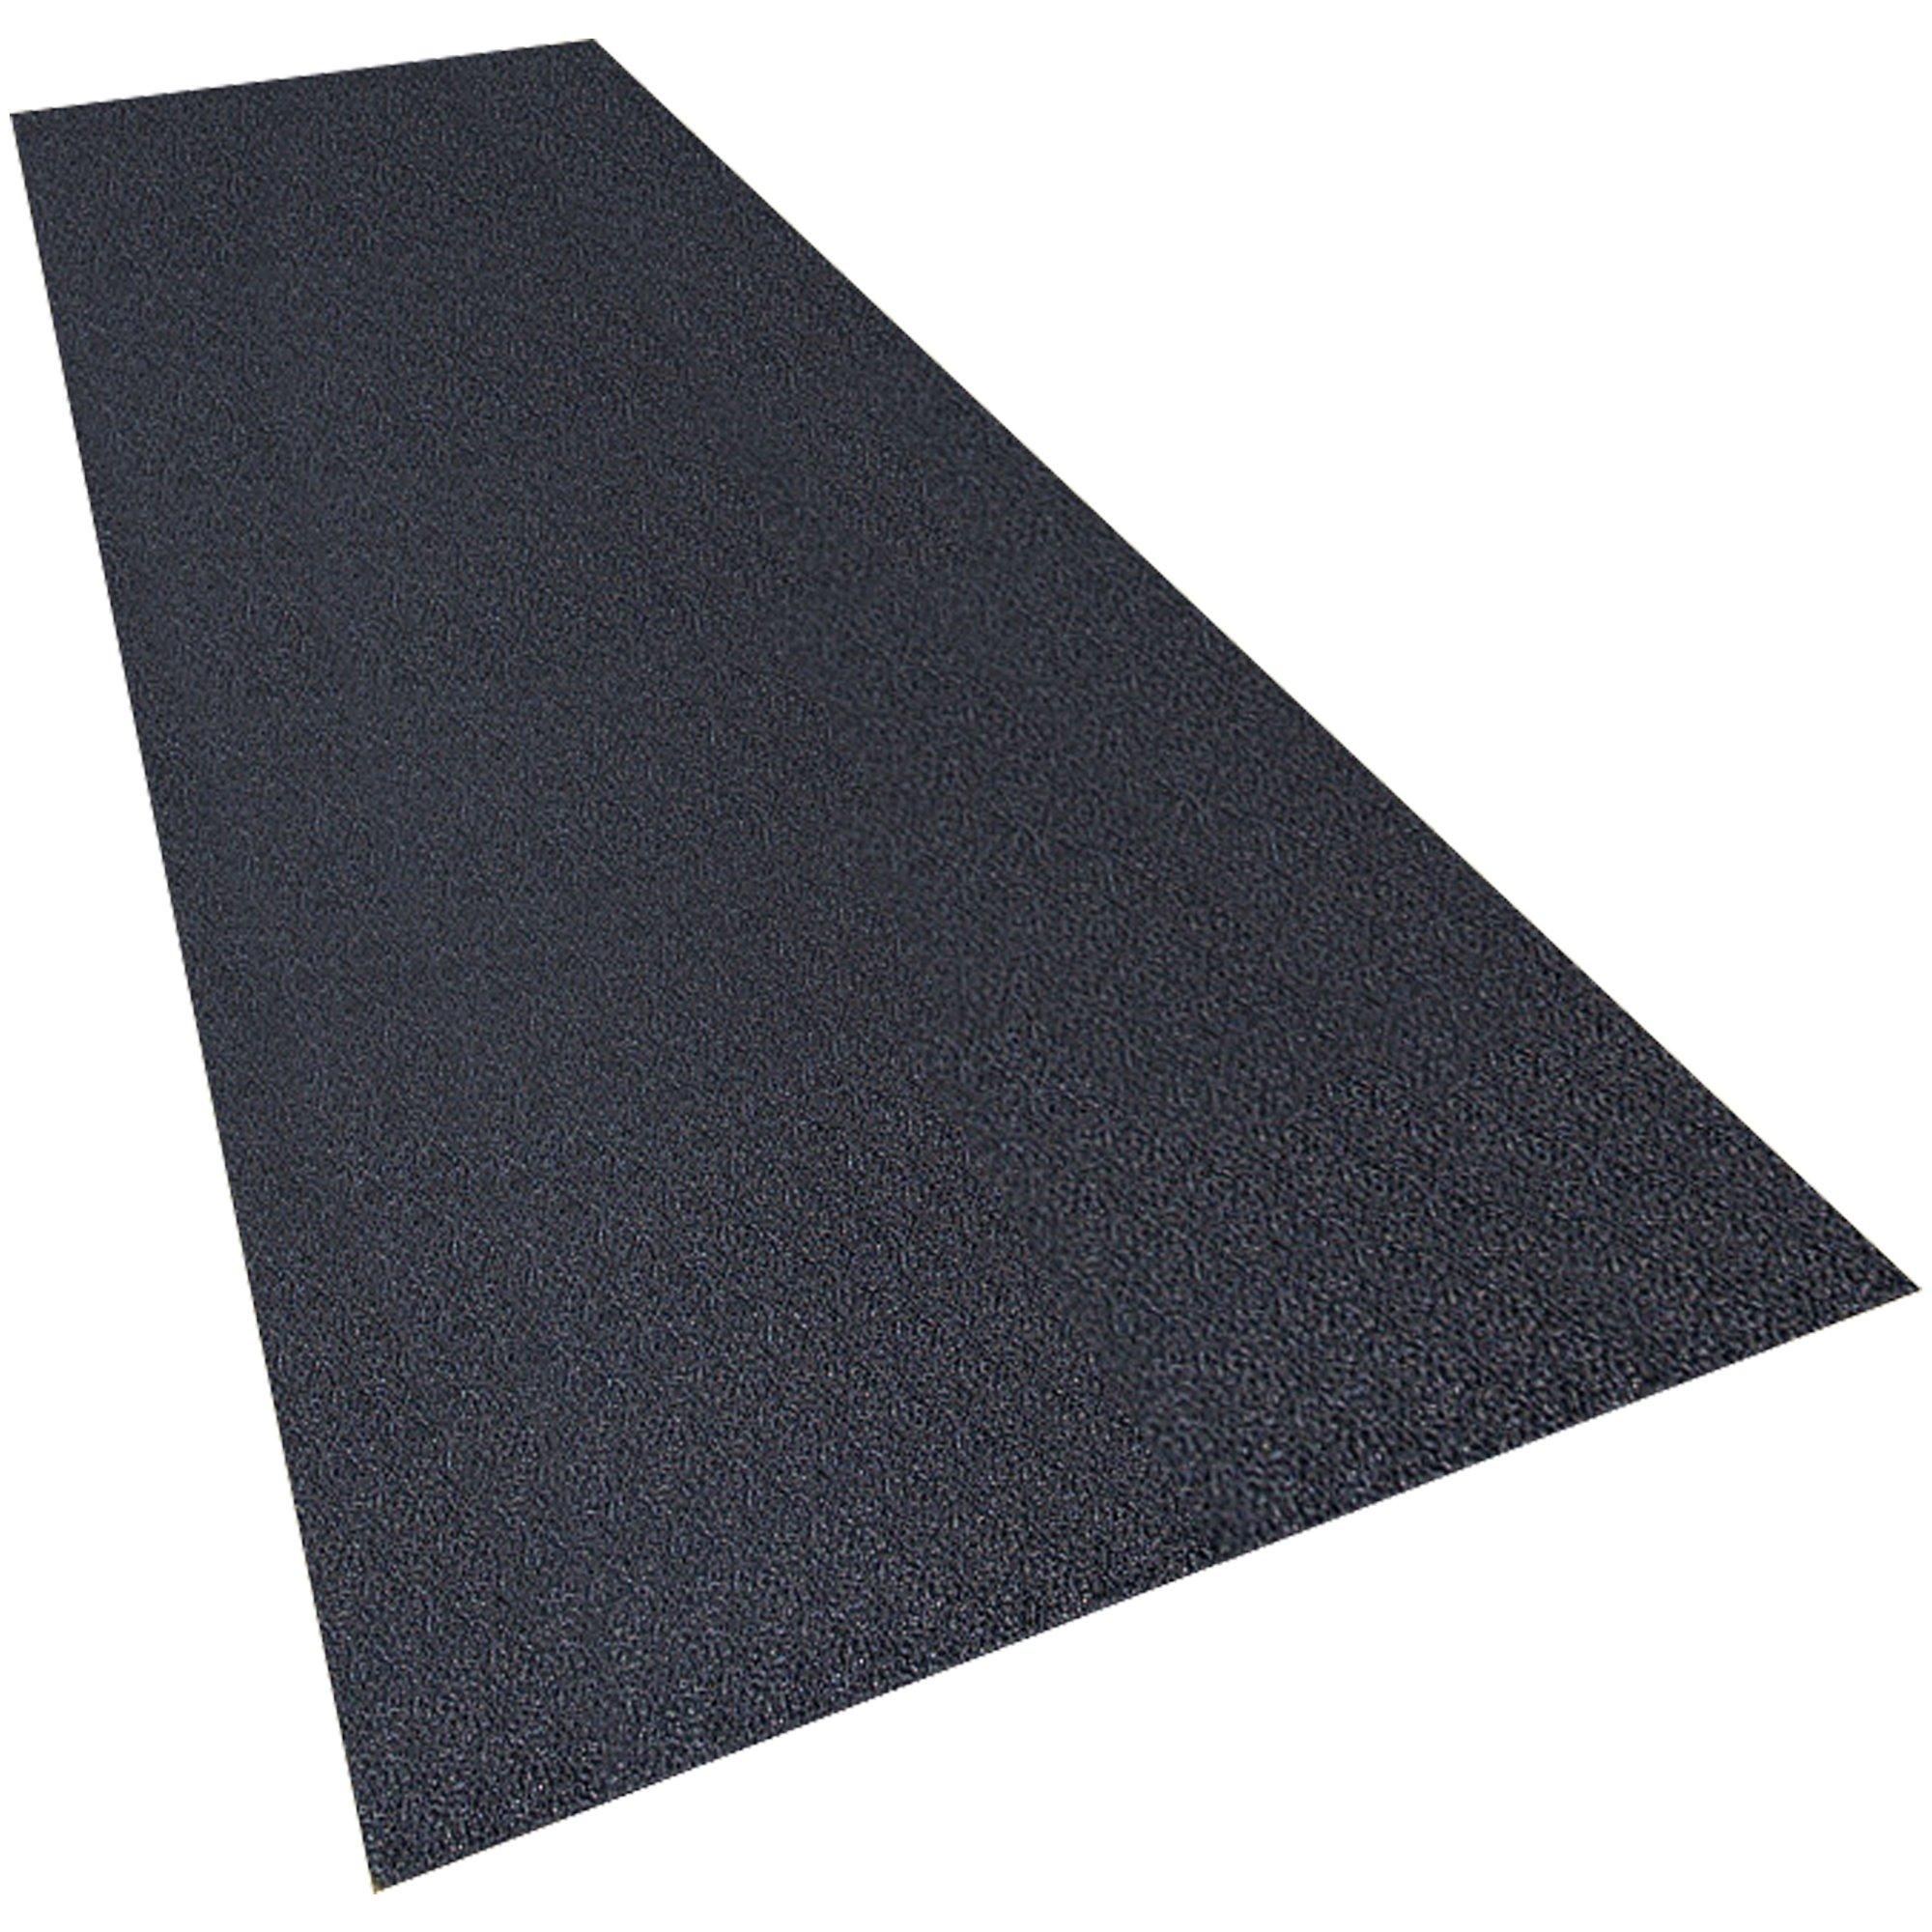 3 x 3' Black Premium Anti-Fatigue Mat